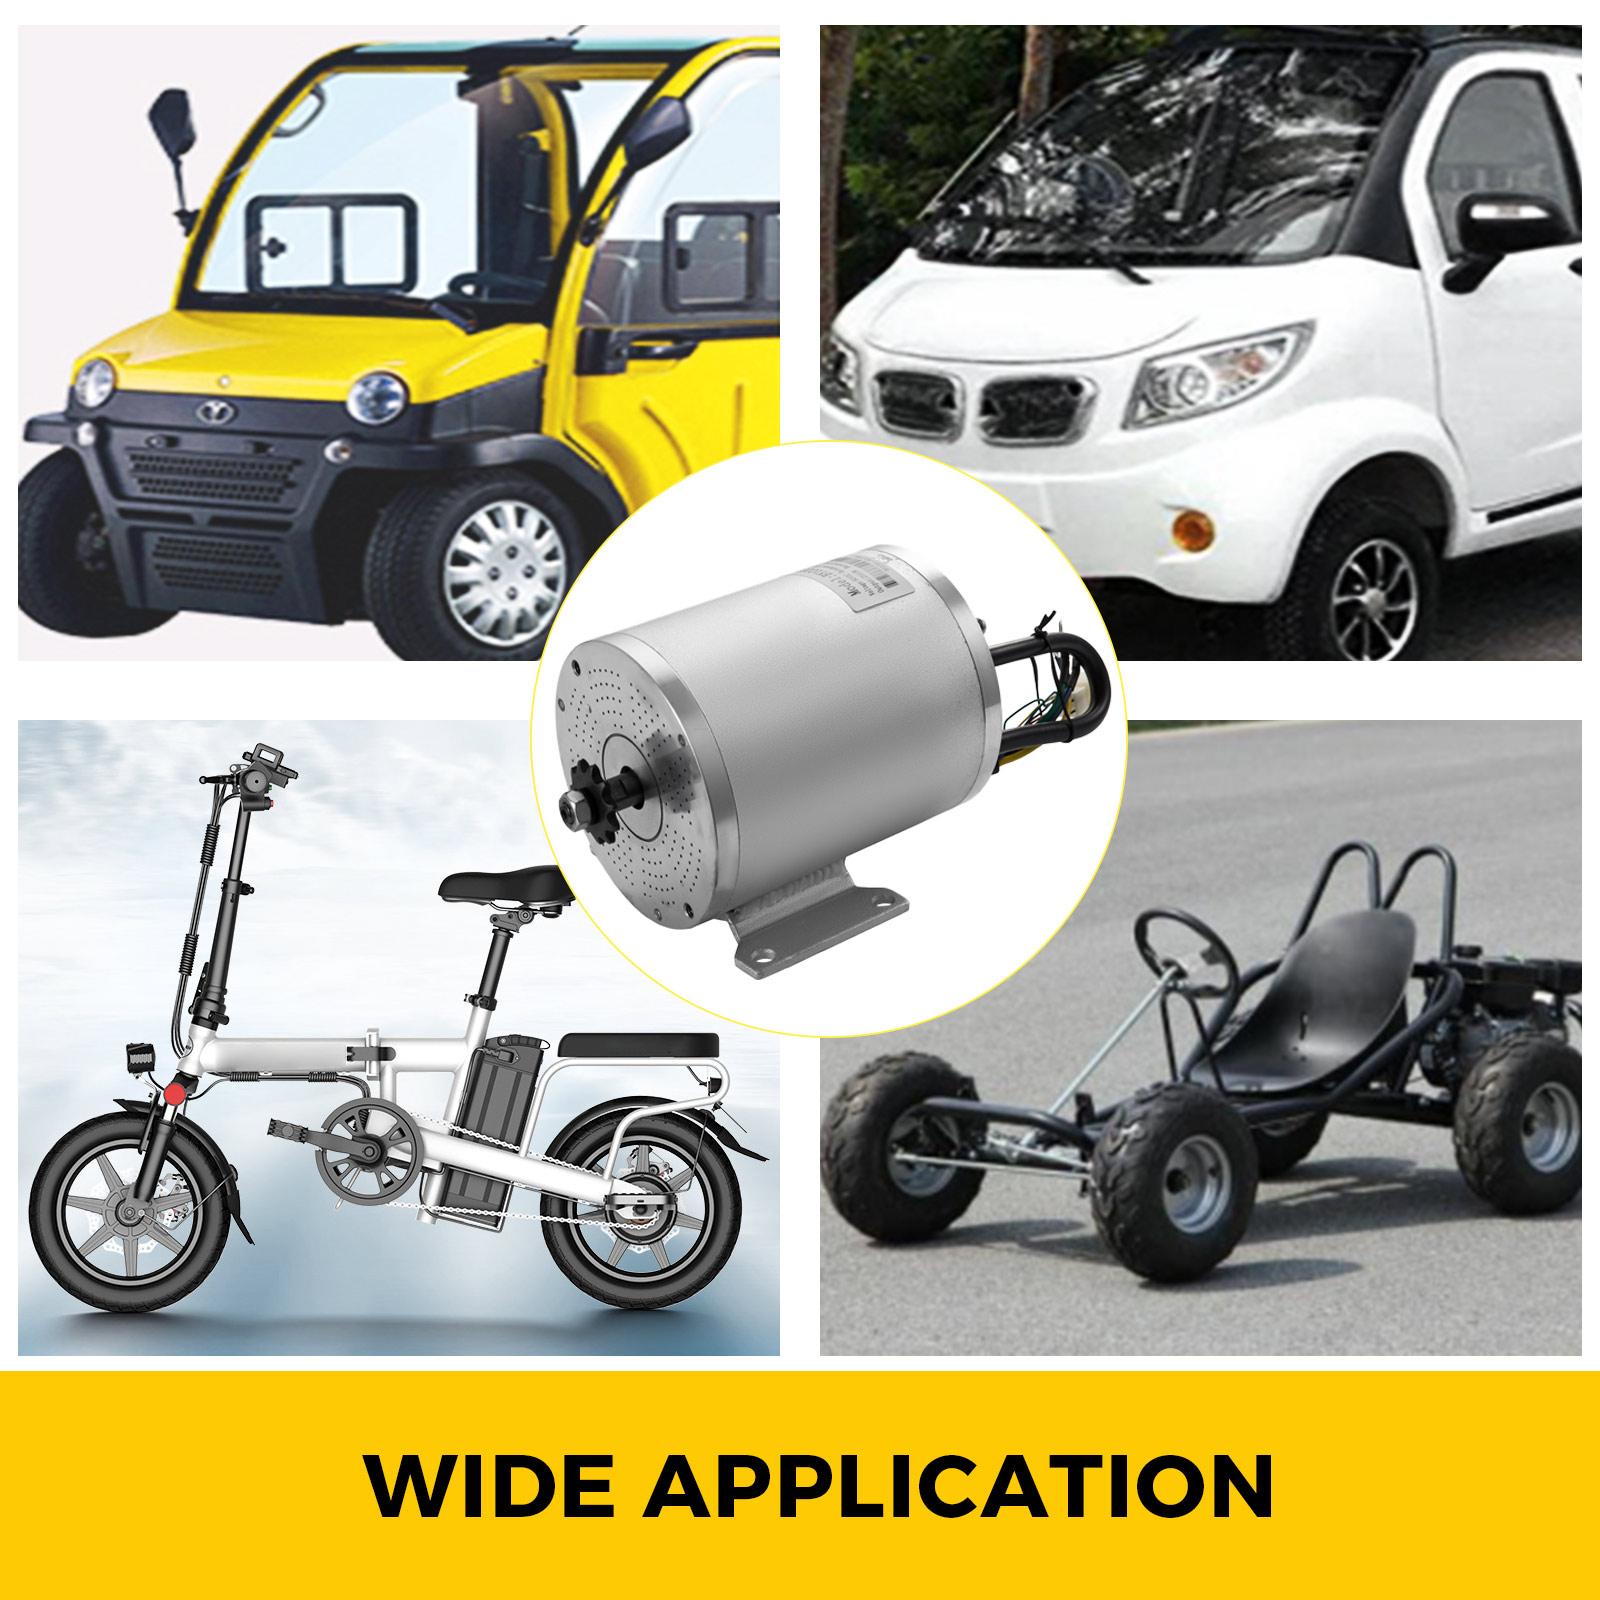 DC-electric-motor-12-60V-150W-2KW-for-scooter-bike-go-kart-minibike-e-ATV thumbnail 175